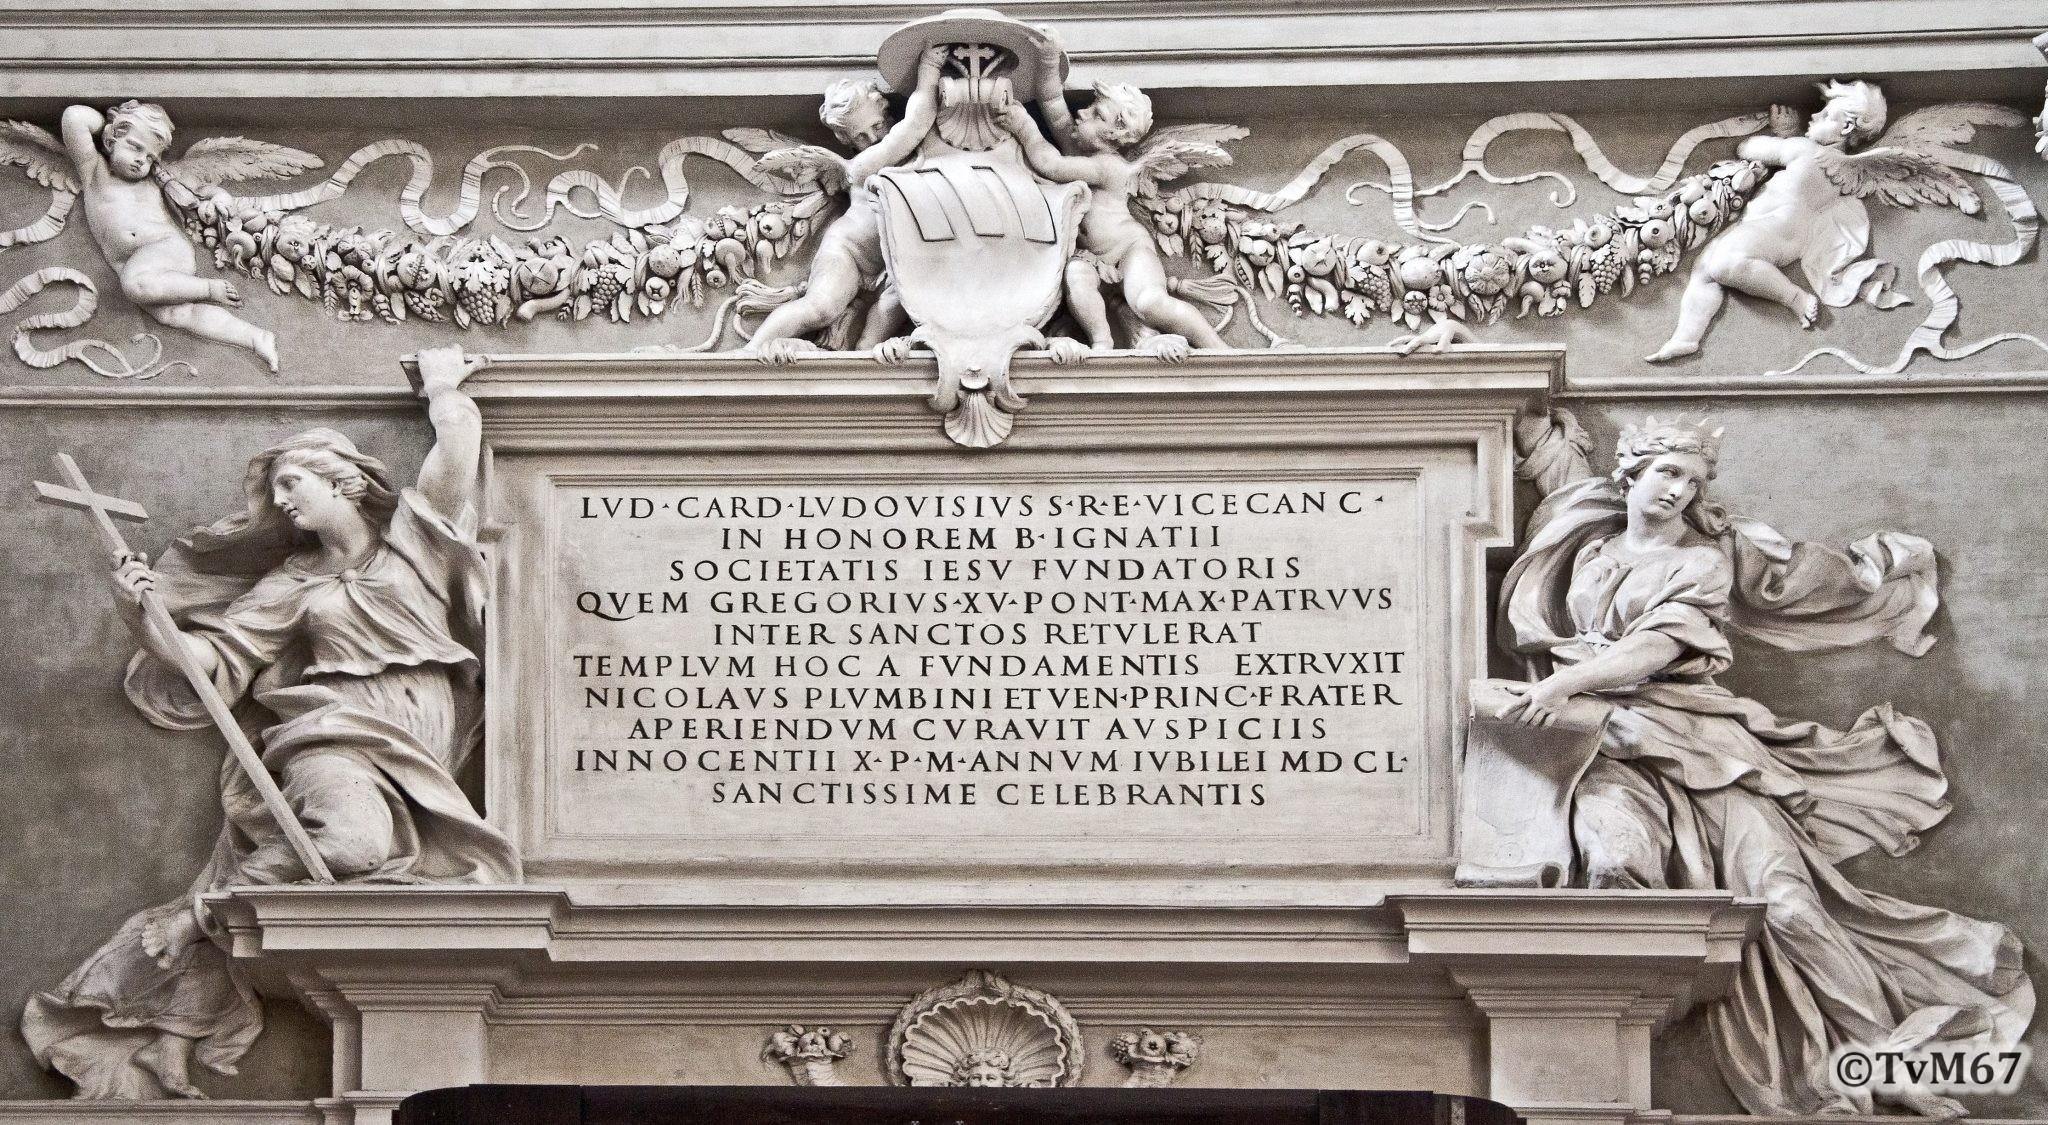 Roma, Chiesa di Sant'Ignazio, Ingangsgevel mi, Wijdingsinscriptie, 2011